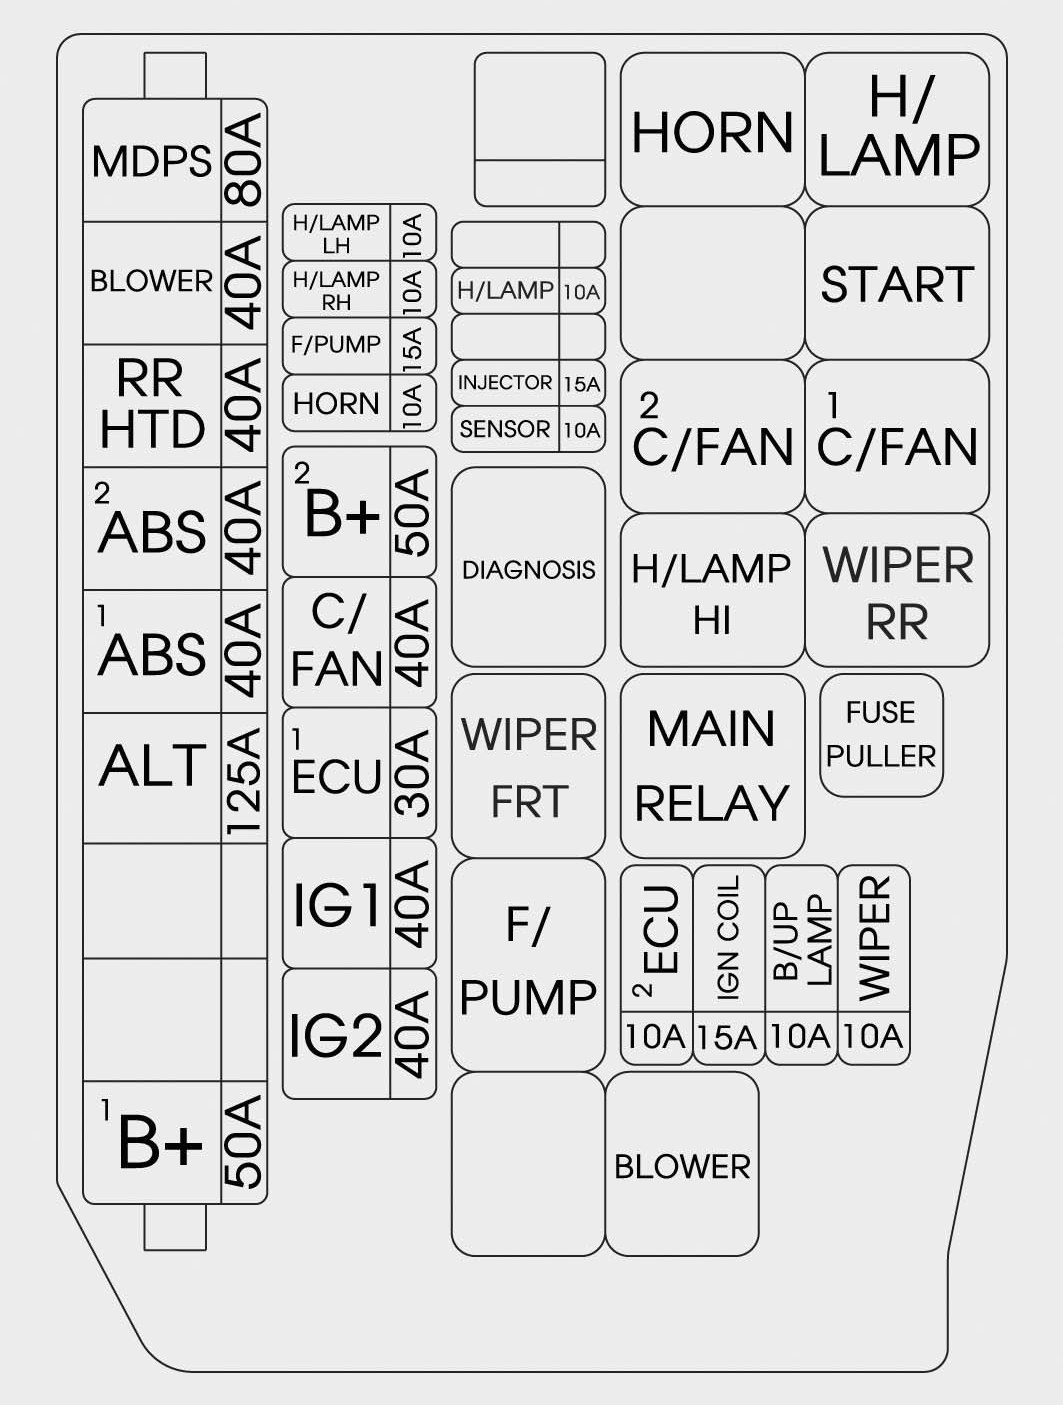 hyundai ix35 fuse box simple wiring diagram schemahyundai ix35 fuse box wiring diagrams 2012 hyundai elantra fuse box hyundai ix35 fuse box